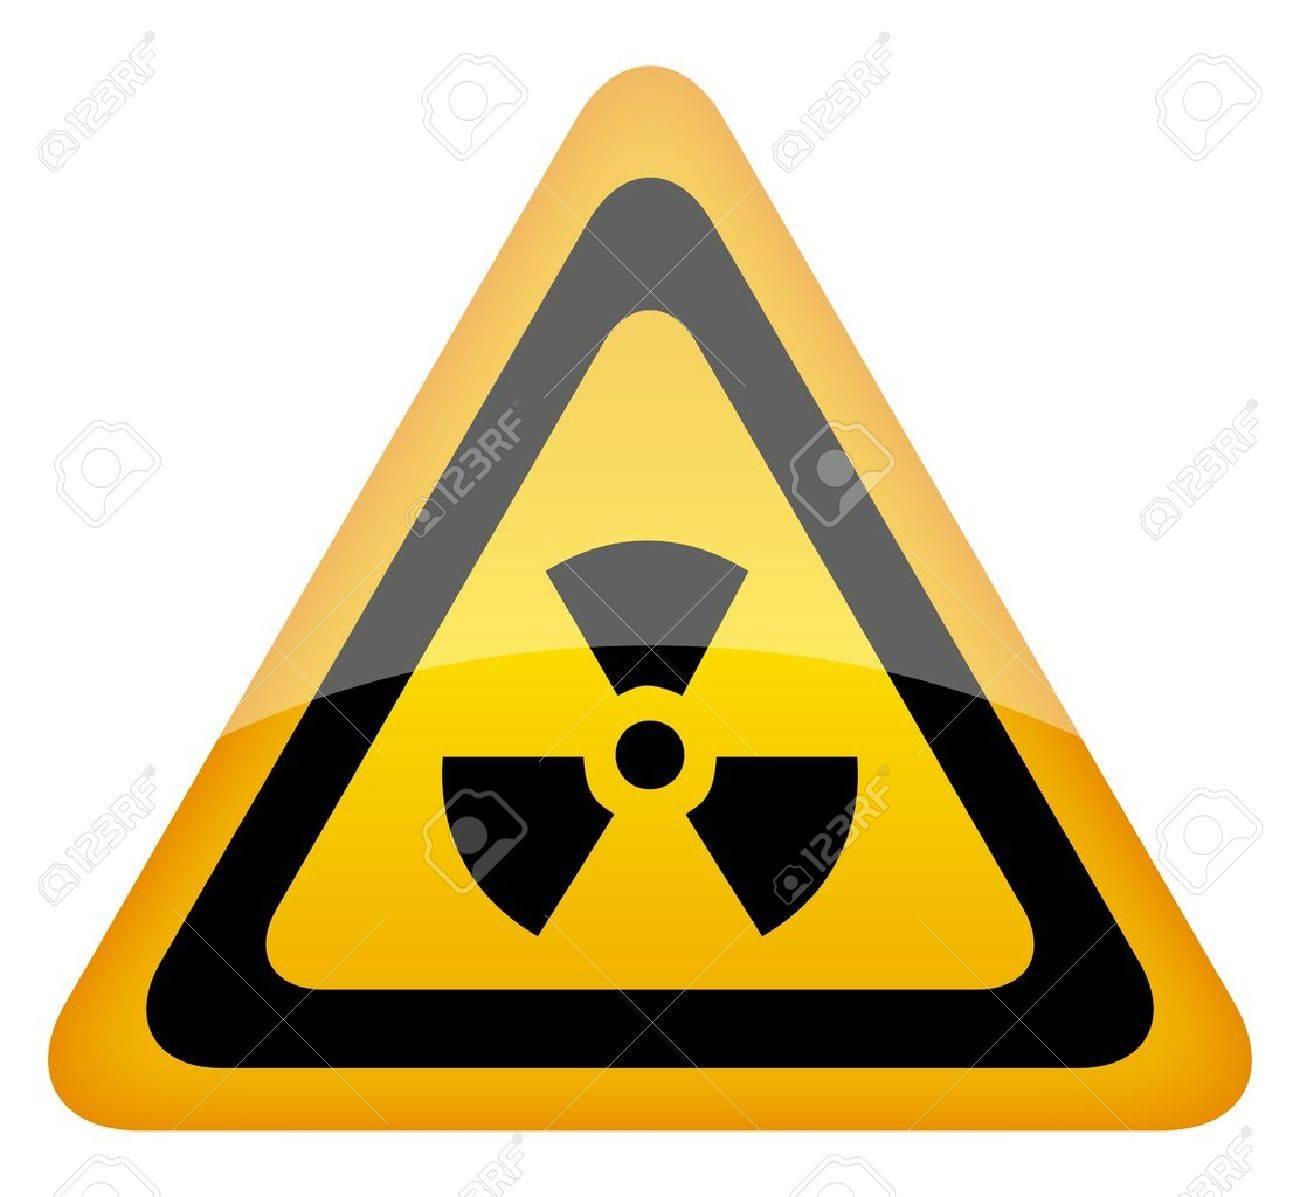 radiation sign illustration Stock Vector - 13185171